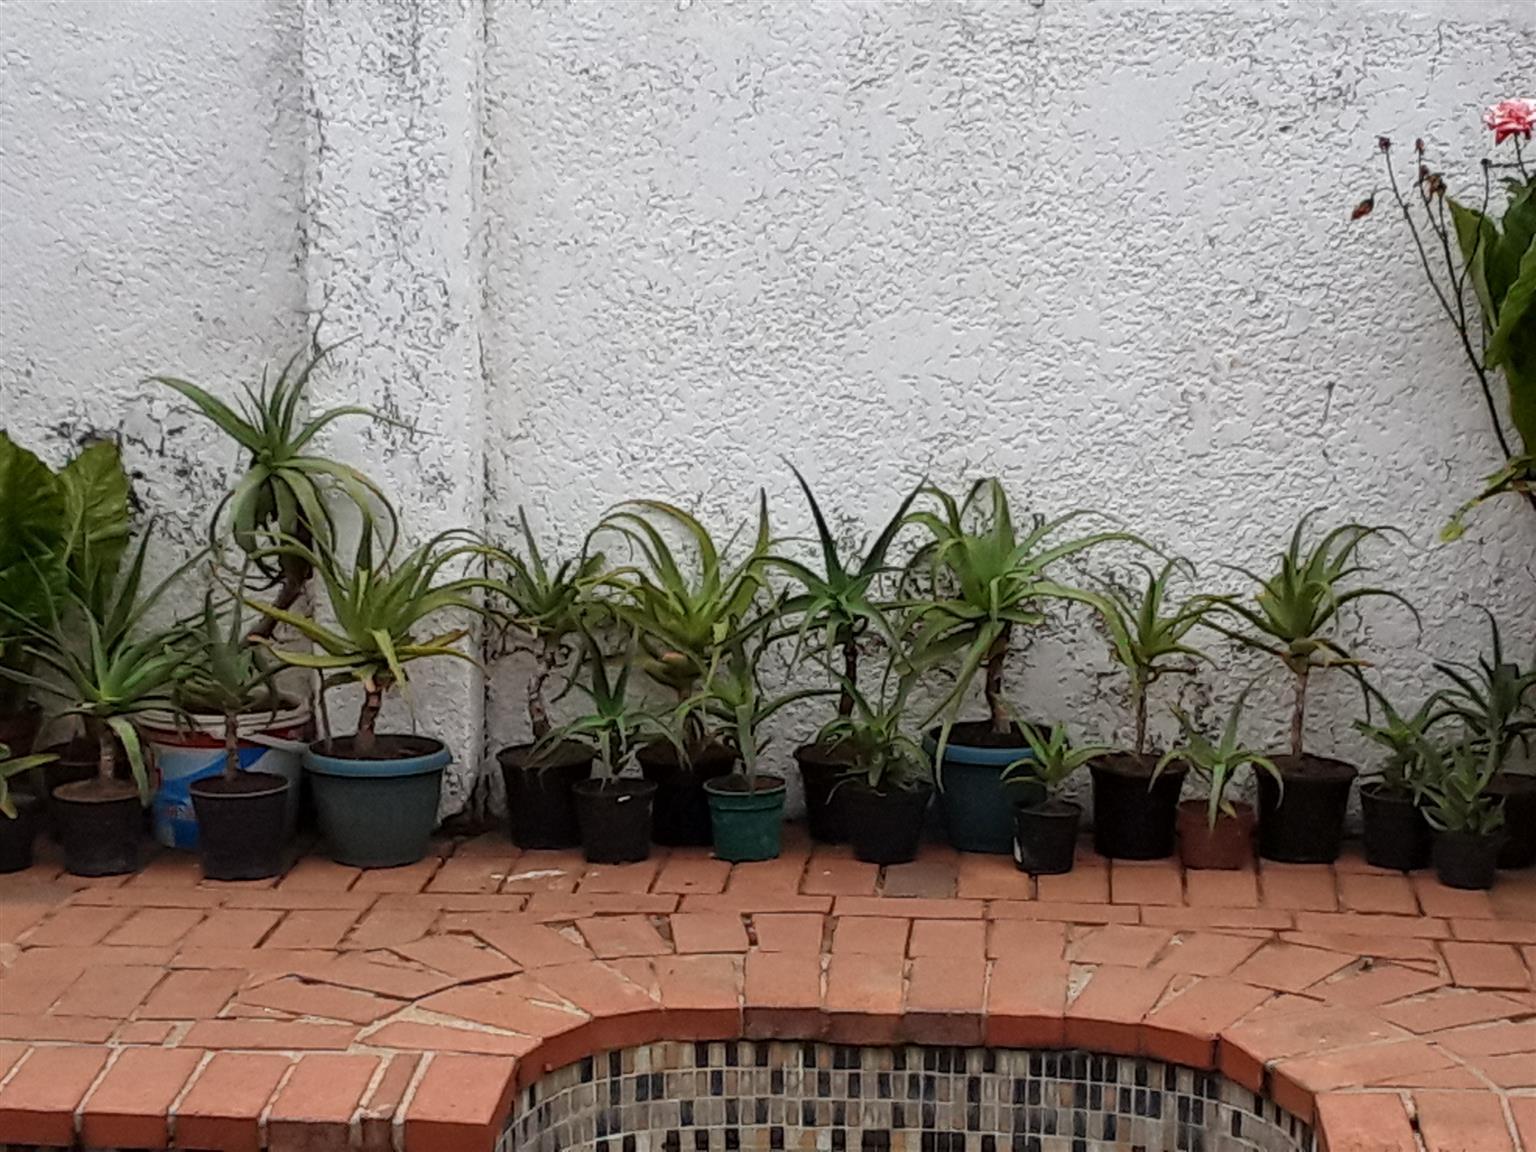 Aloe Vera plants in pots. Assorted height. R10 per cm.